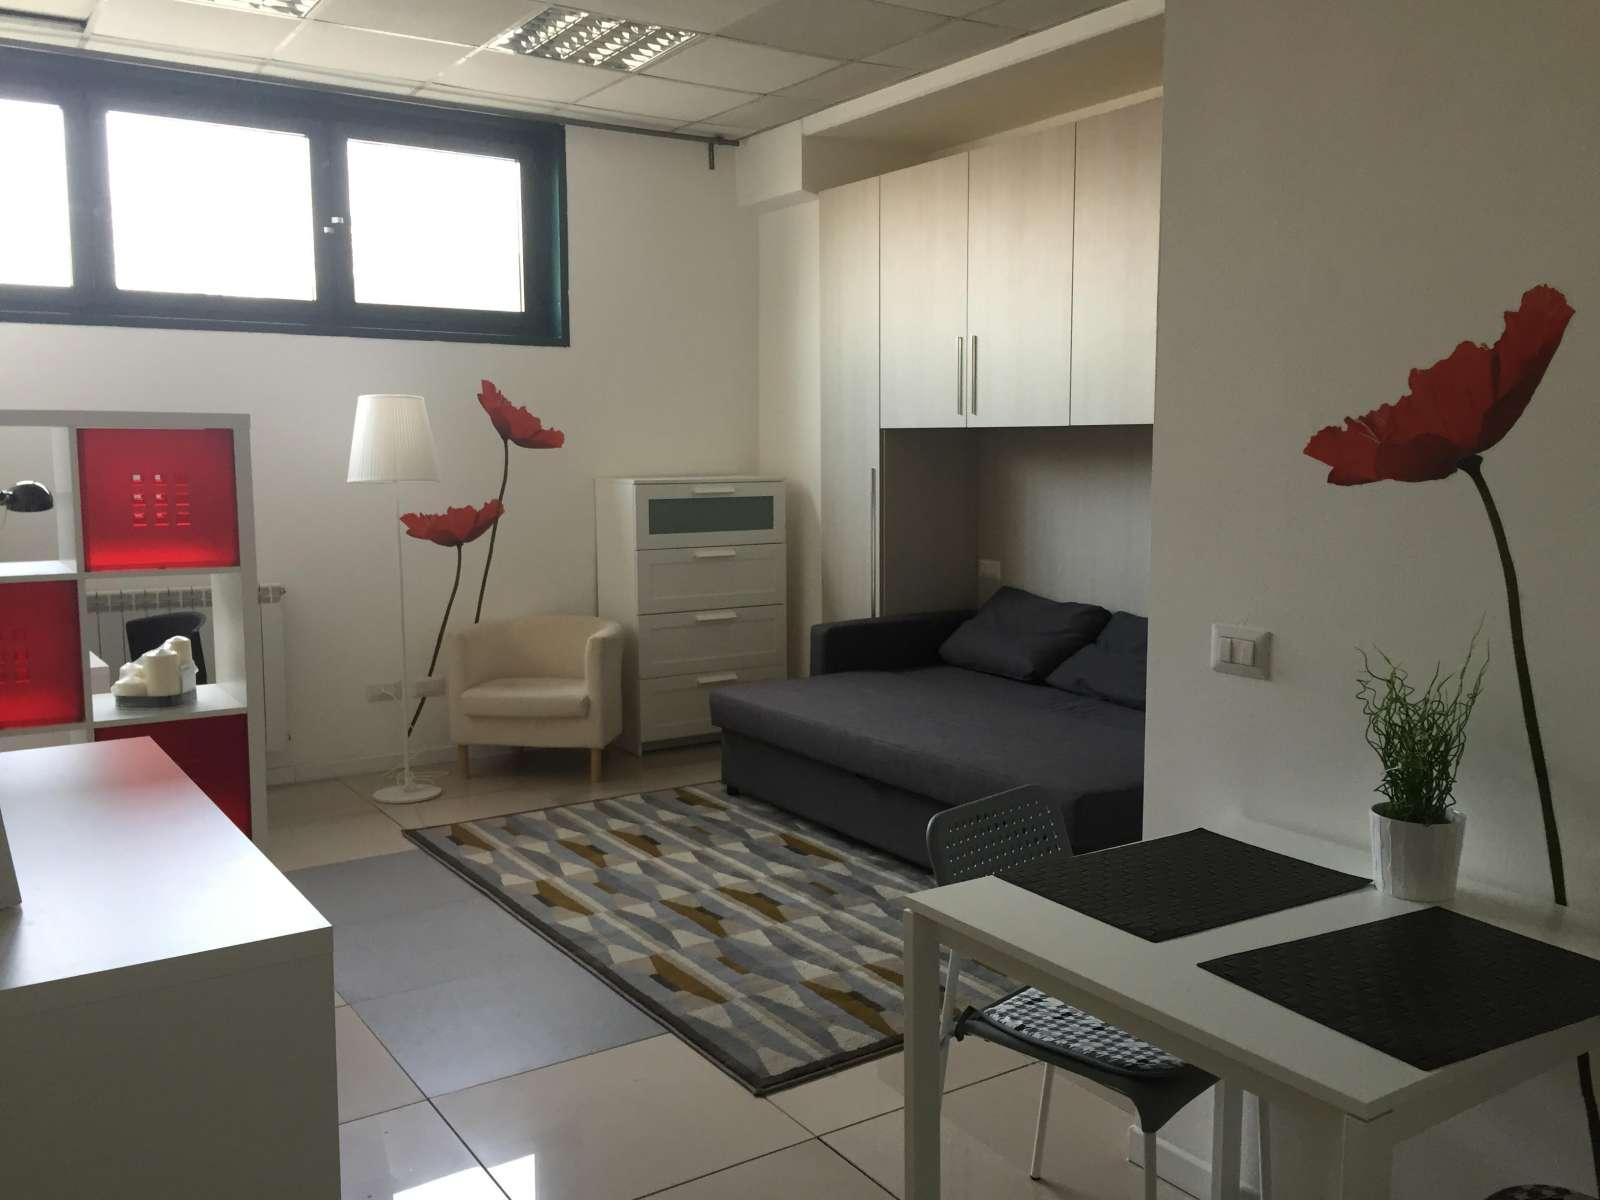 Equipped studio apartment for rent in Bovisa Milan ref 102426